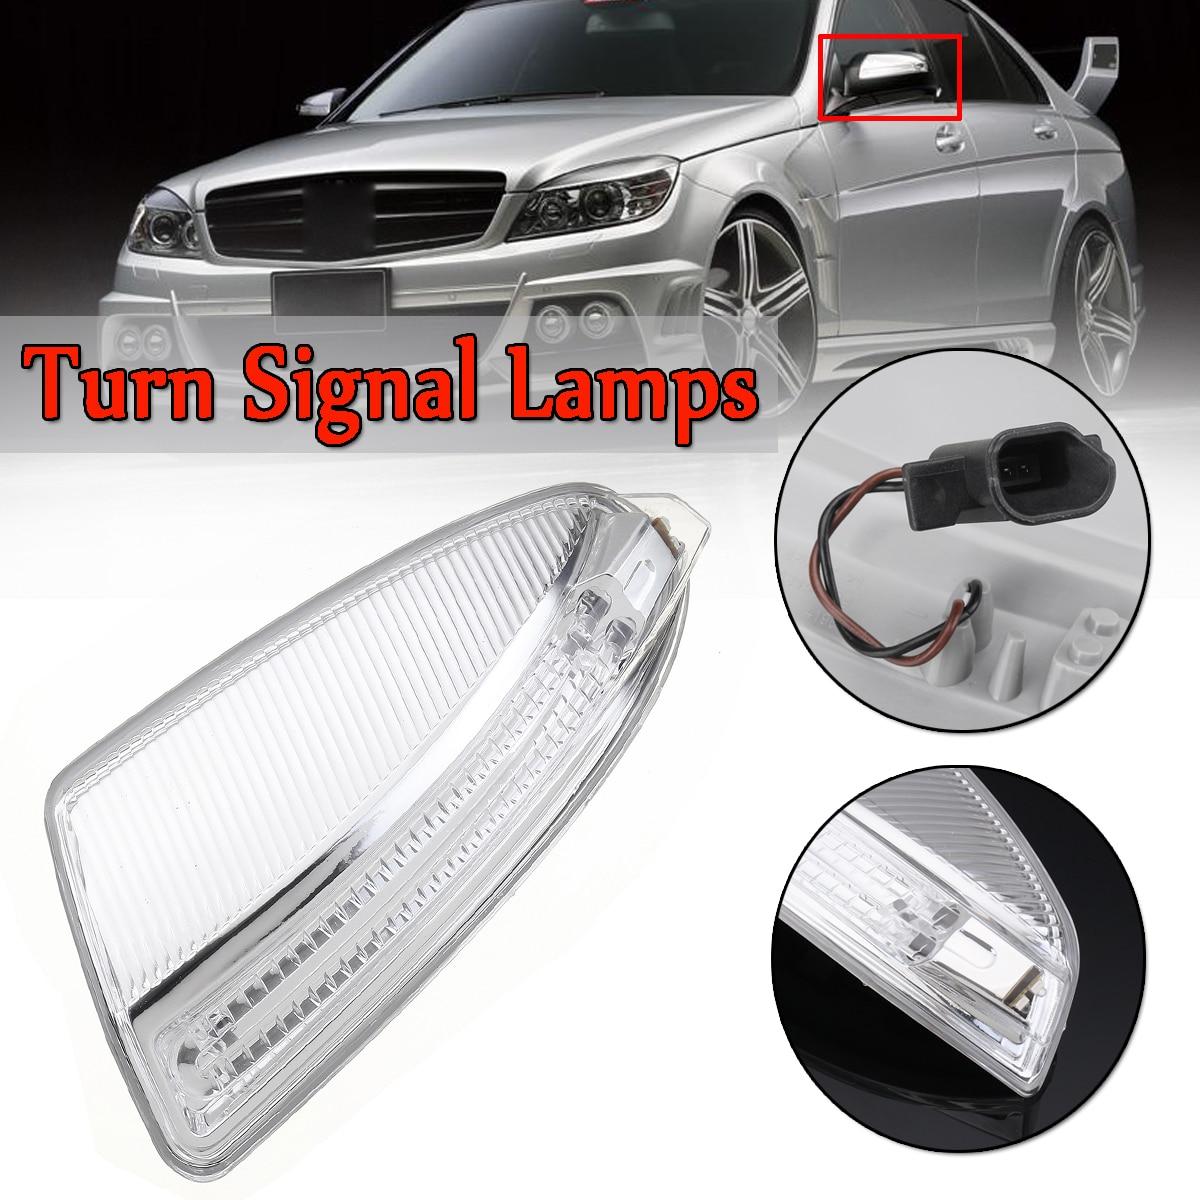 Door Rearview Mirror Turn Signal Lamps Lights Auto For MercedesFor Benz ML  Class W164 ML300 ML500 ML550 C-Class W204 Left/Right